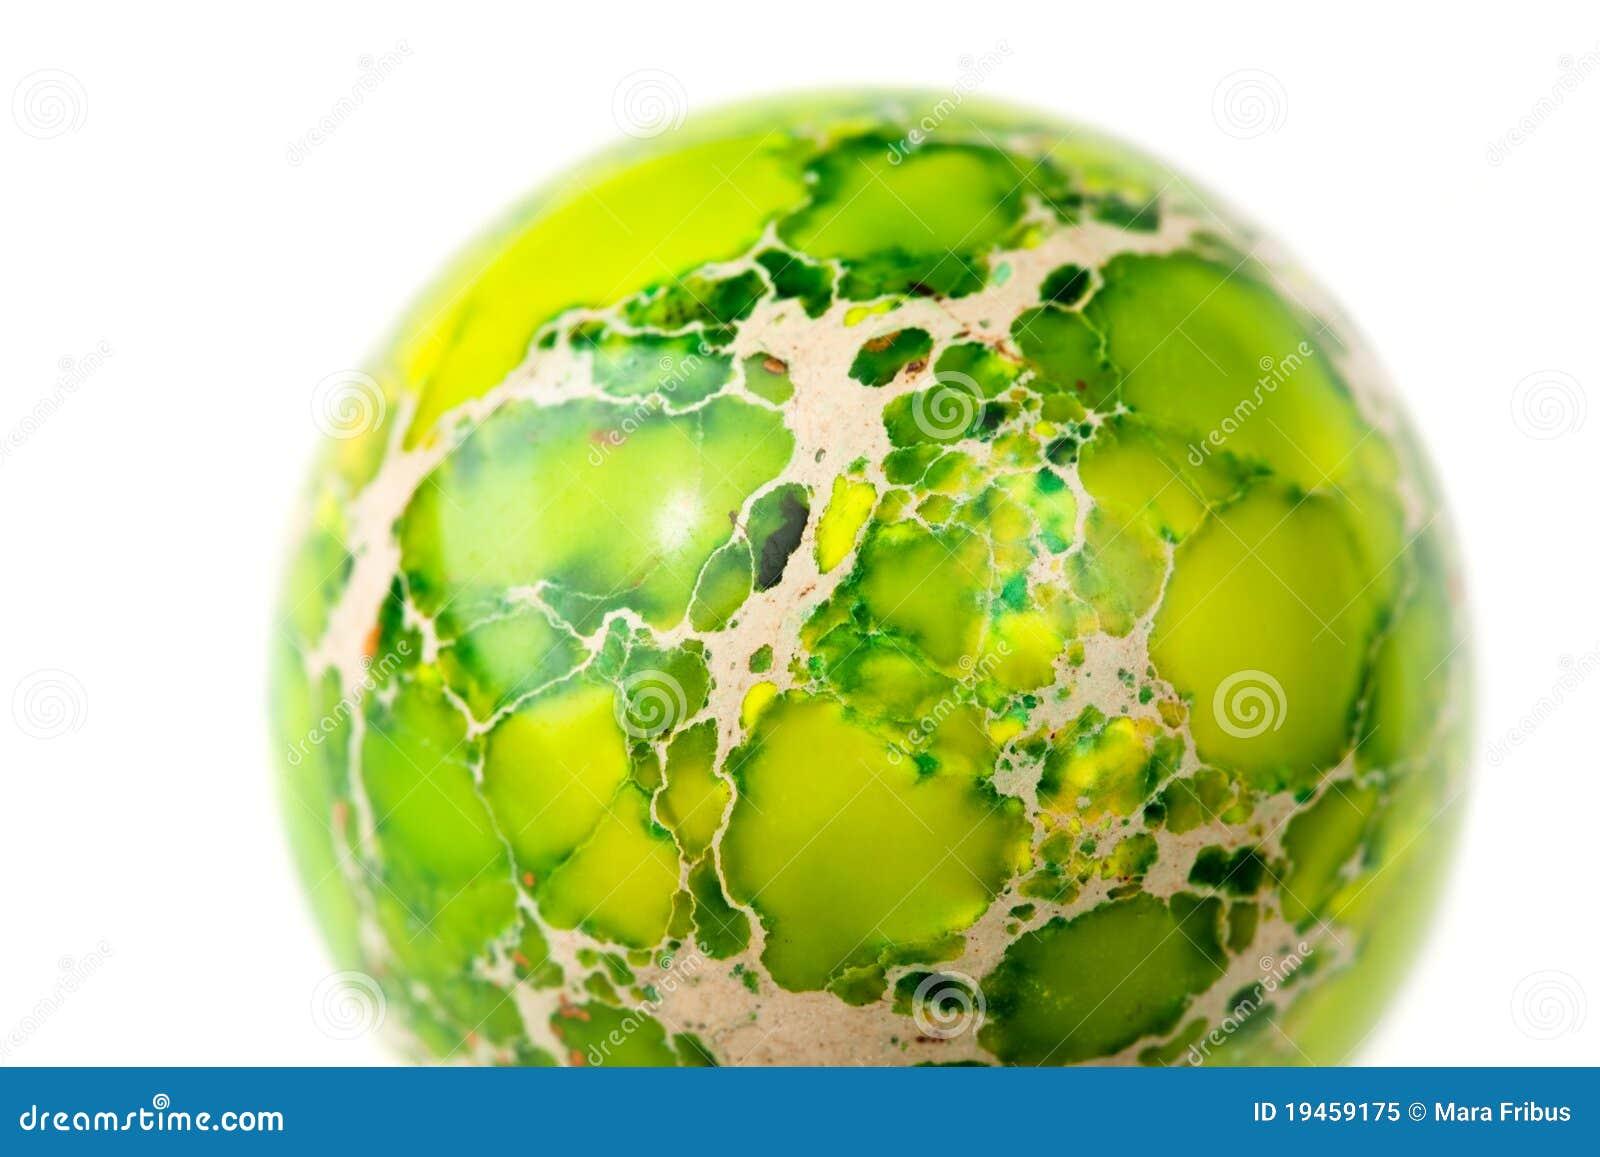 Groen jaspisgebied